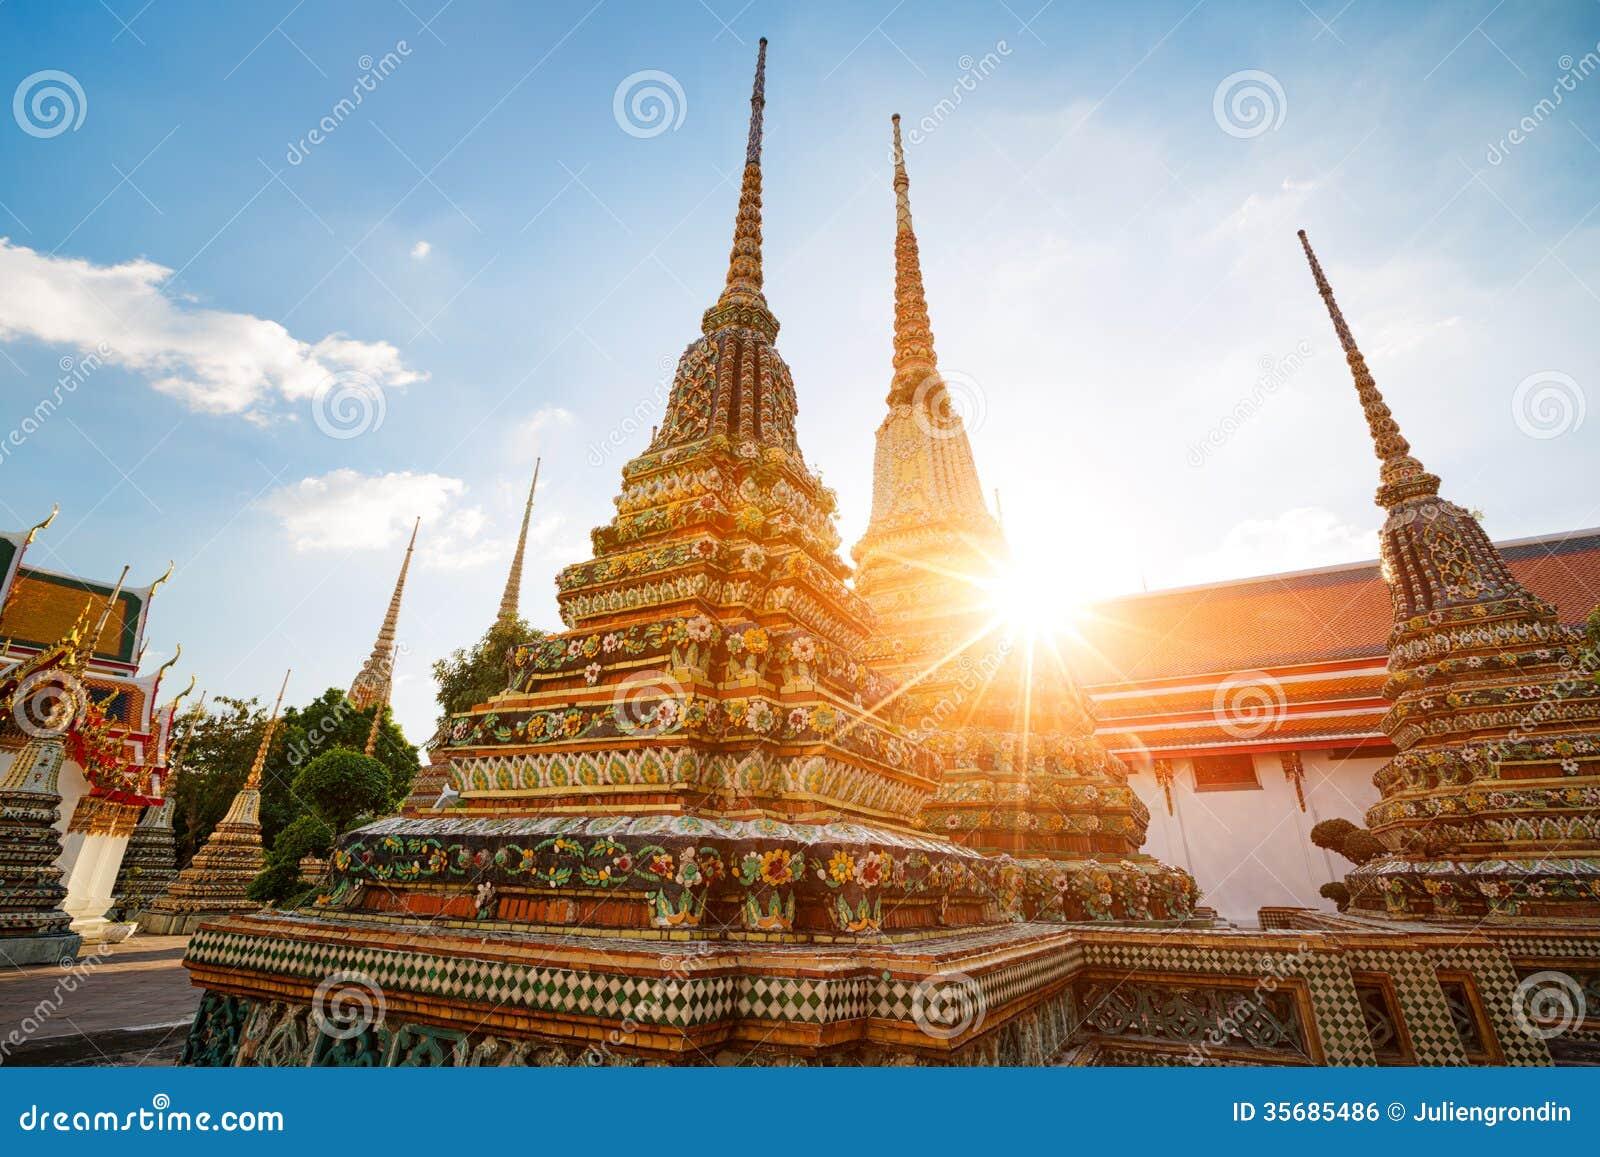 Wat Pho en Bangkok, Tailandia